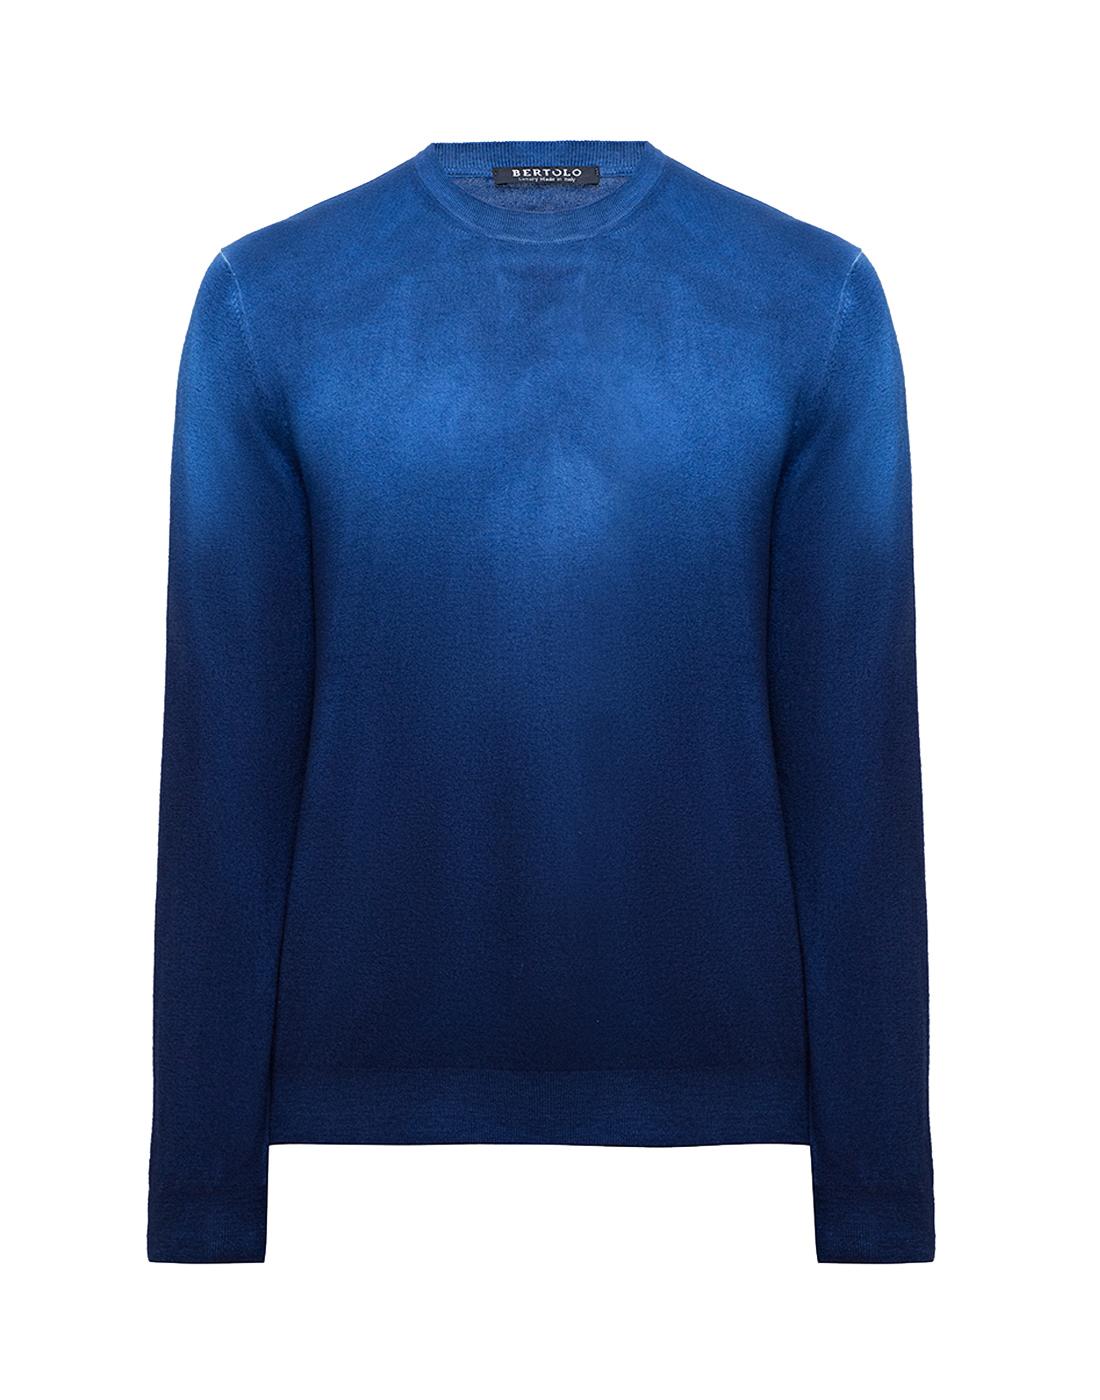 Мужской темно-синий джемпер  Bertolo S901638-1